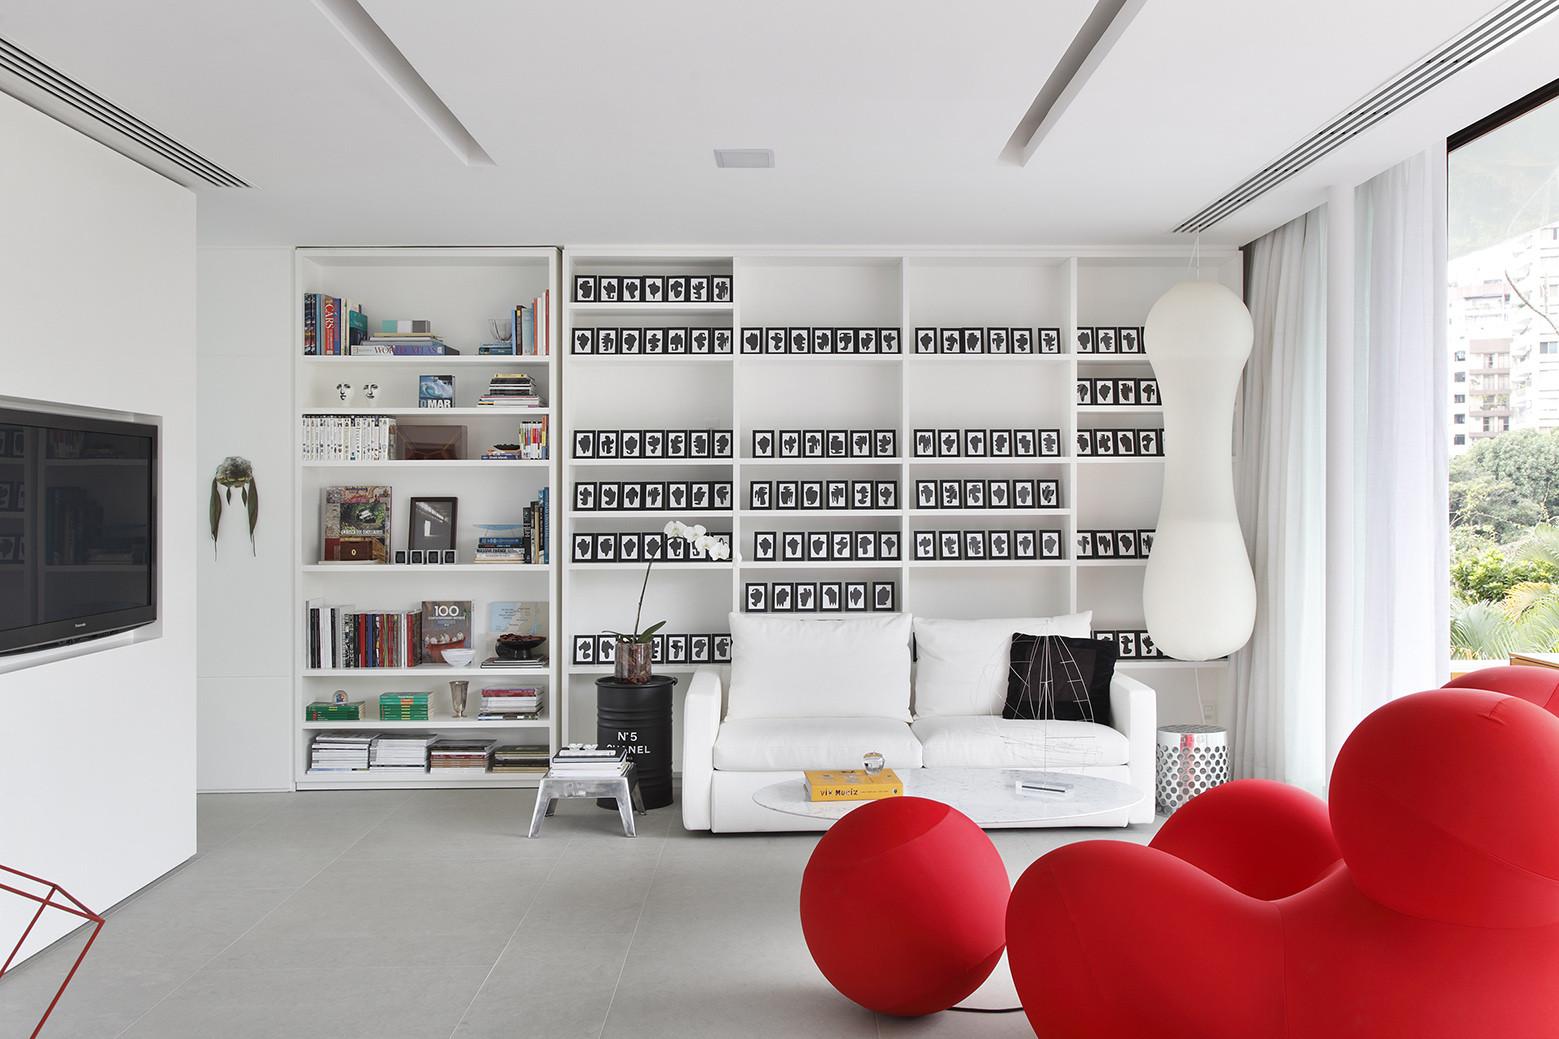 Casa Tempo / Gisele Taranto Arquitetura ArchDaily Brasil #941015 1559 1039